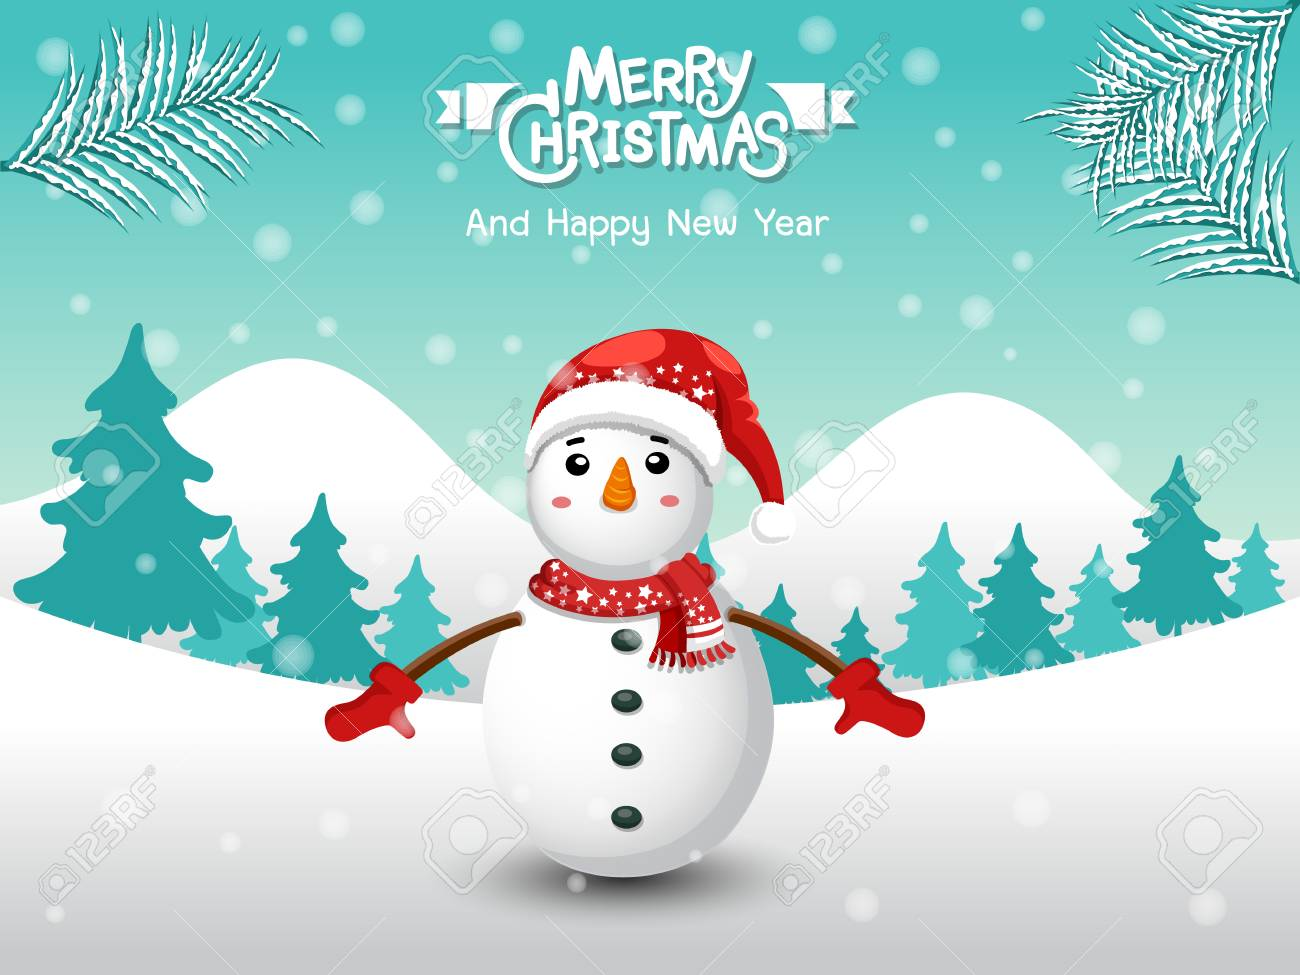 Christmas Scene.Merry Christmas Funny Snowman In Christmas Snow Scene Winter